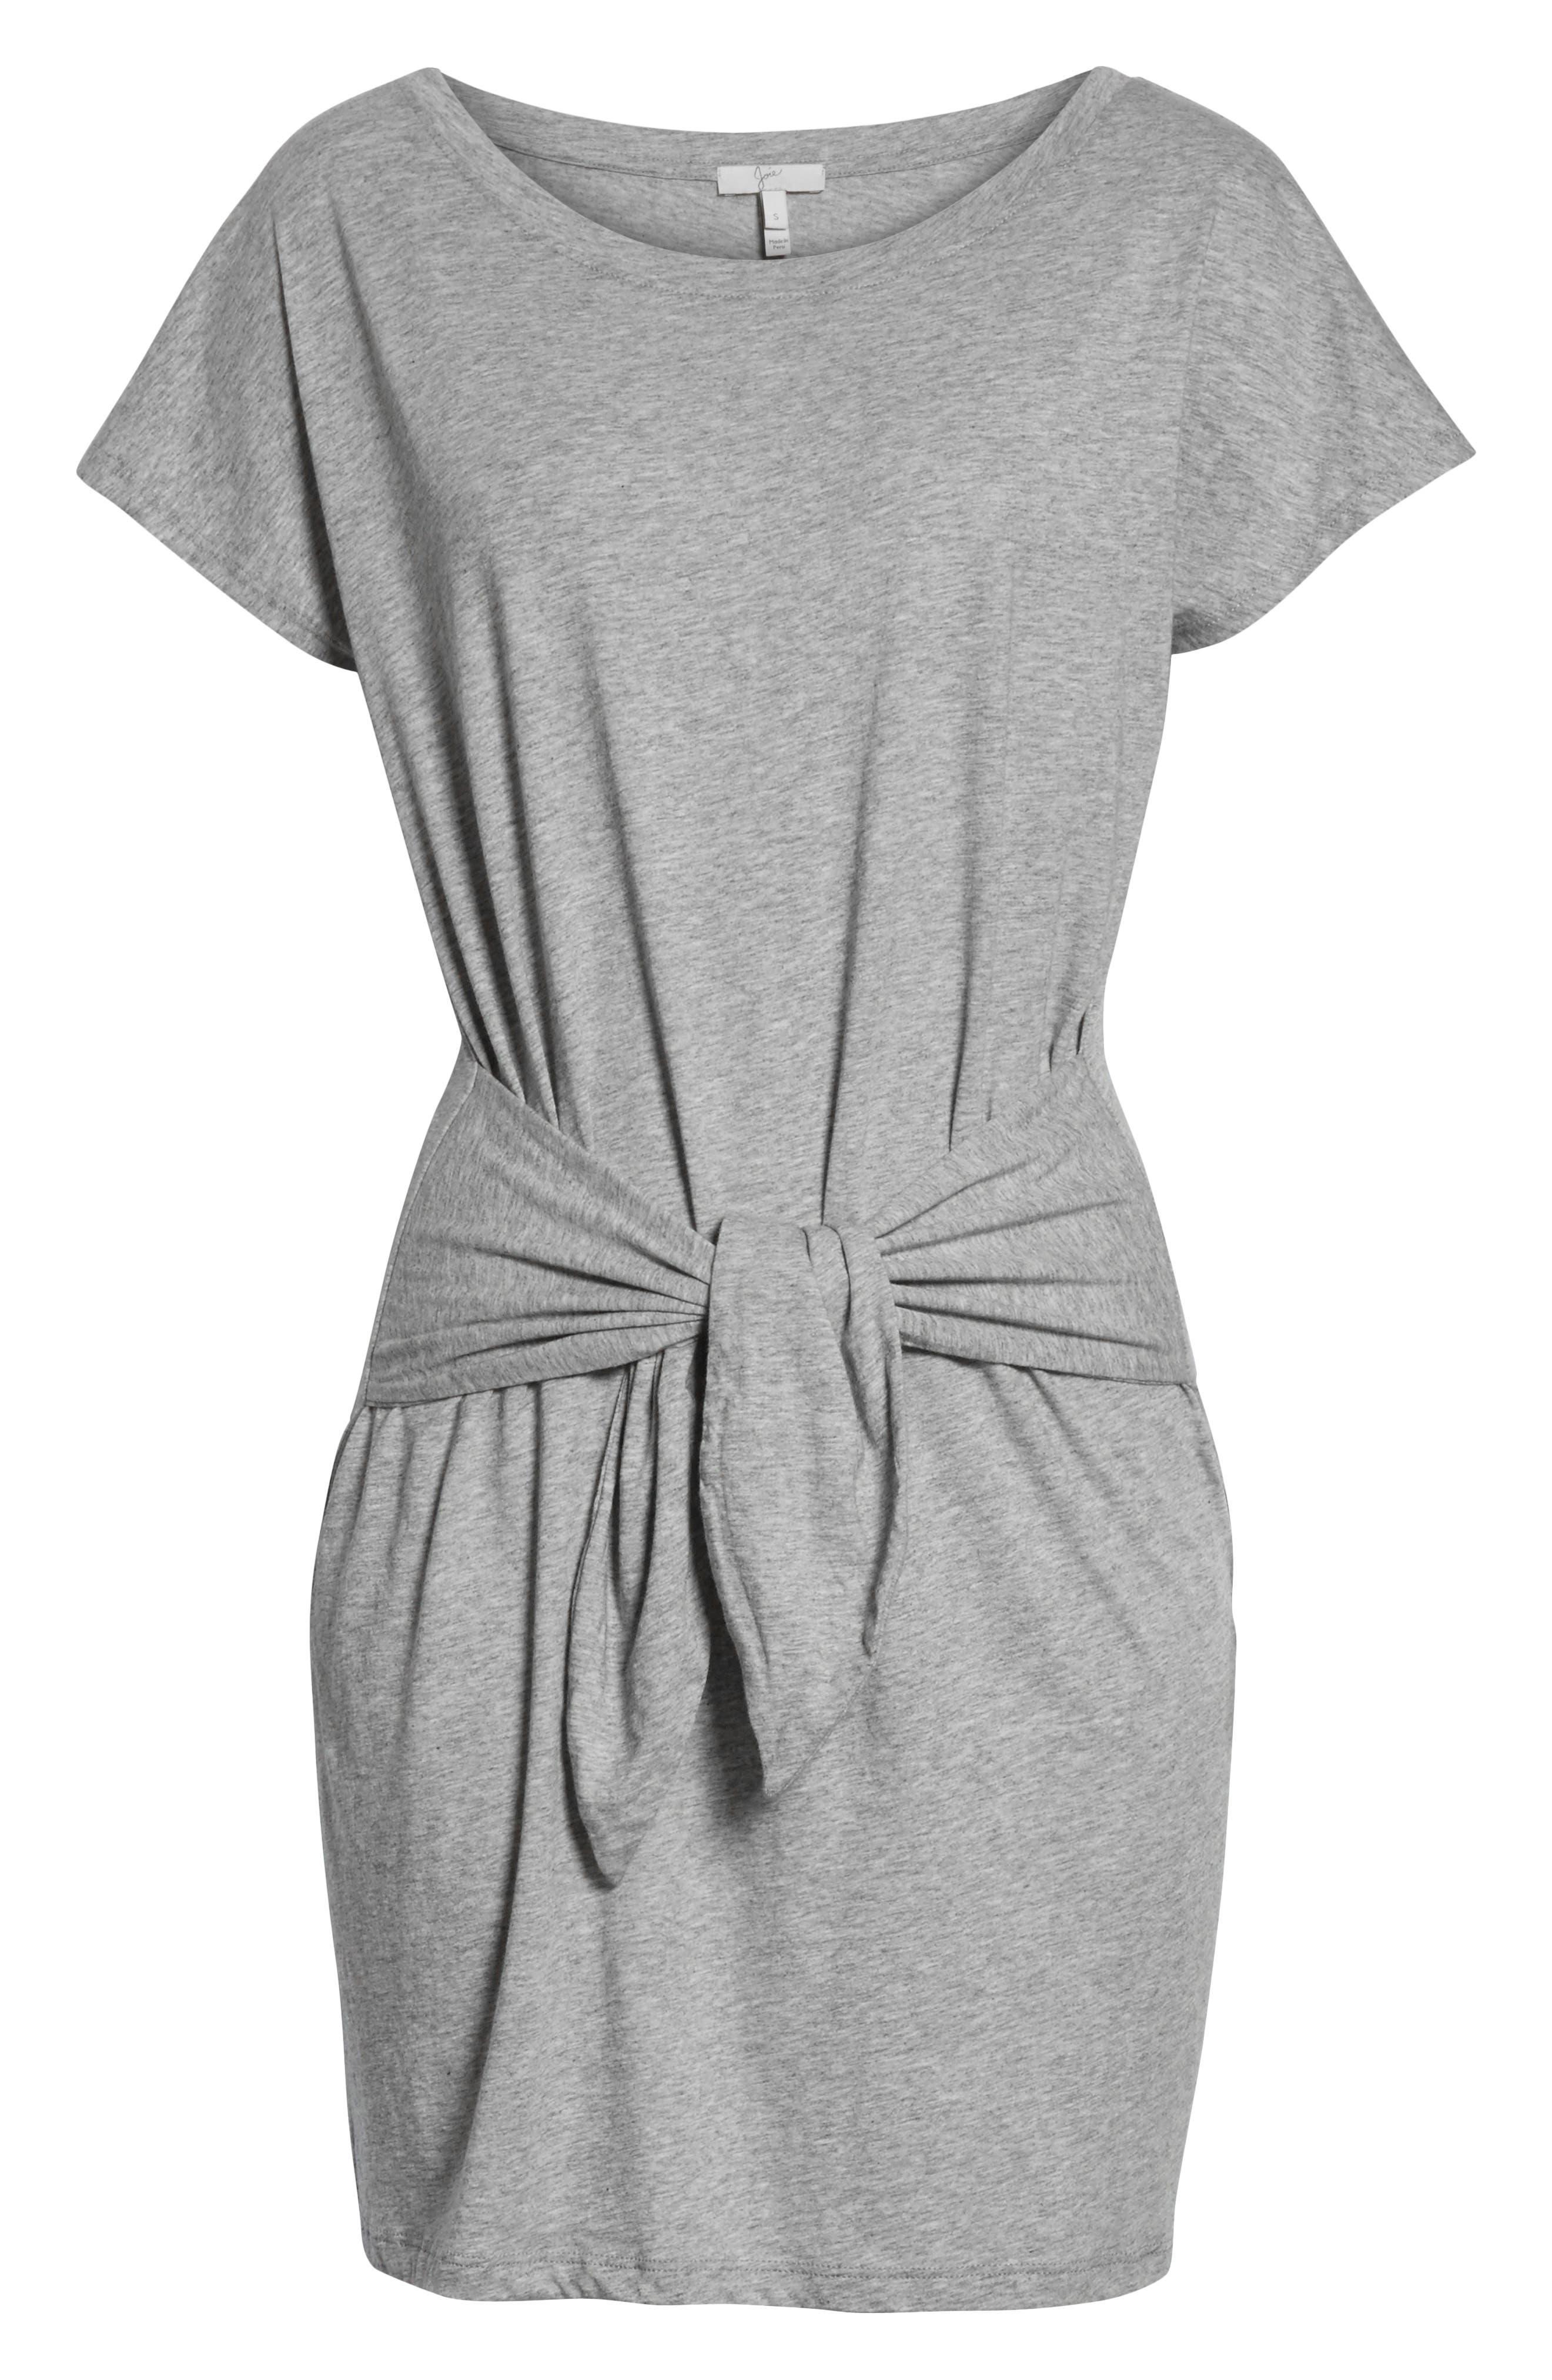 Alyra Tie Waist Cotton T-Shirt Dress,                             Alternate thumbnail 7, color,                             030